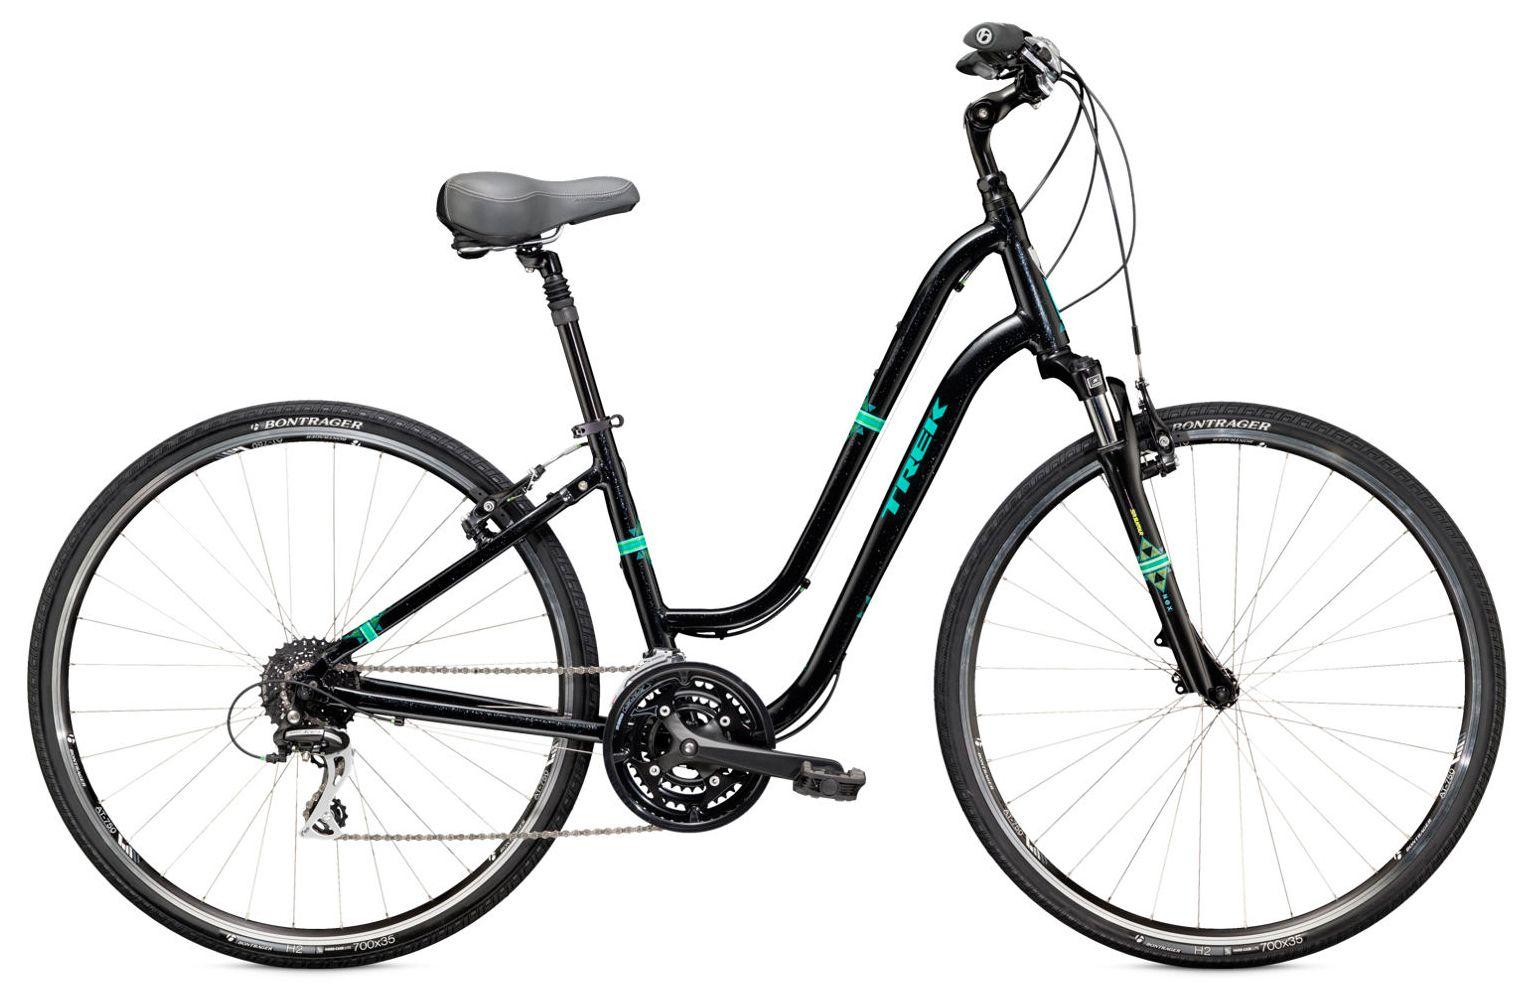 Велосипед Trek Verve 3 WSD 2016 велосипед trek madone 3 1 wsd 2013